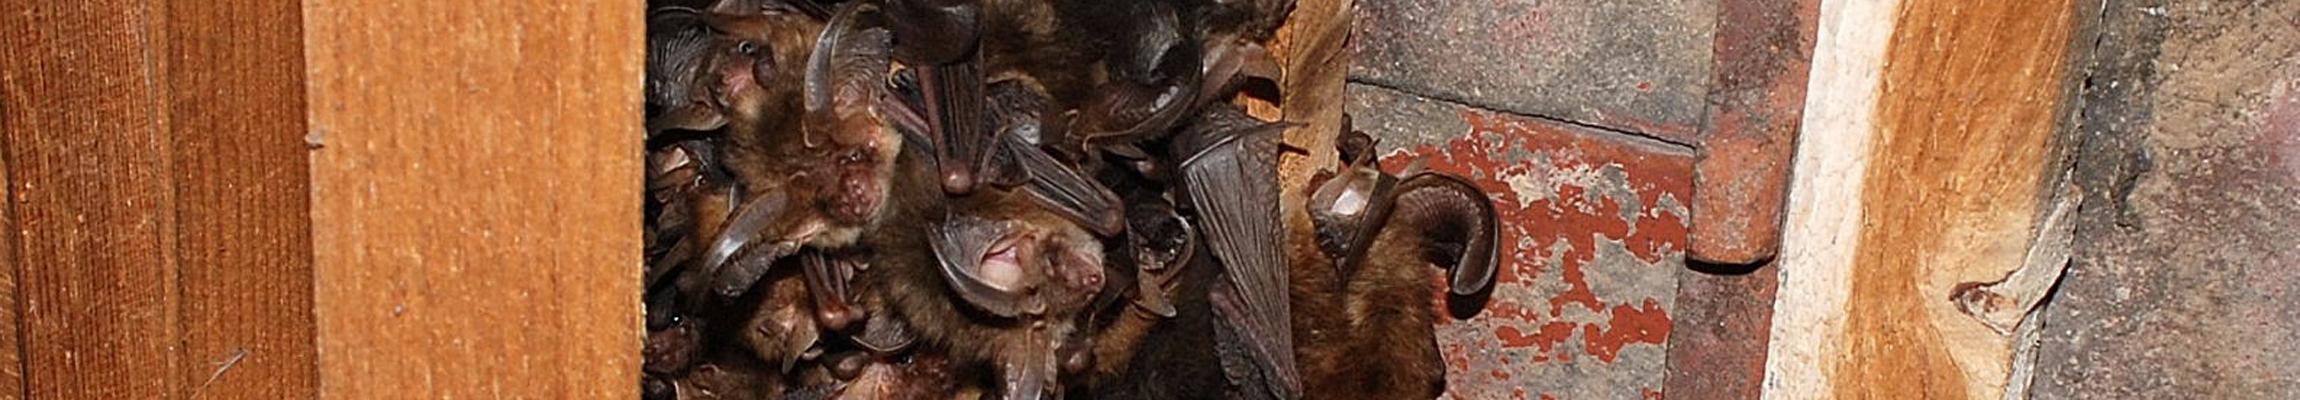 bat-group